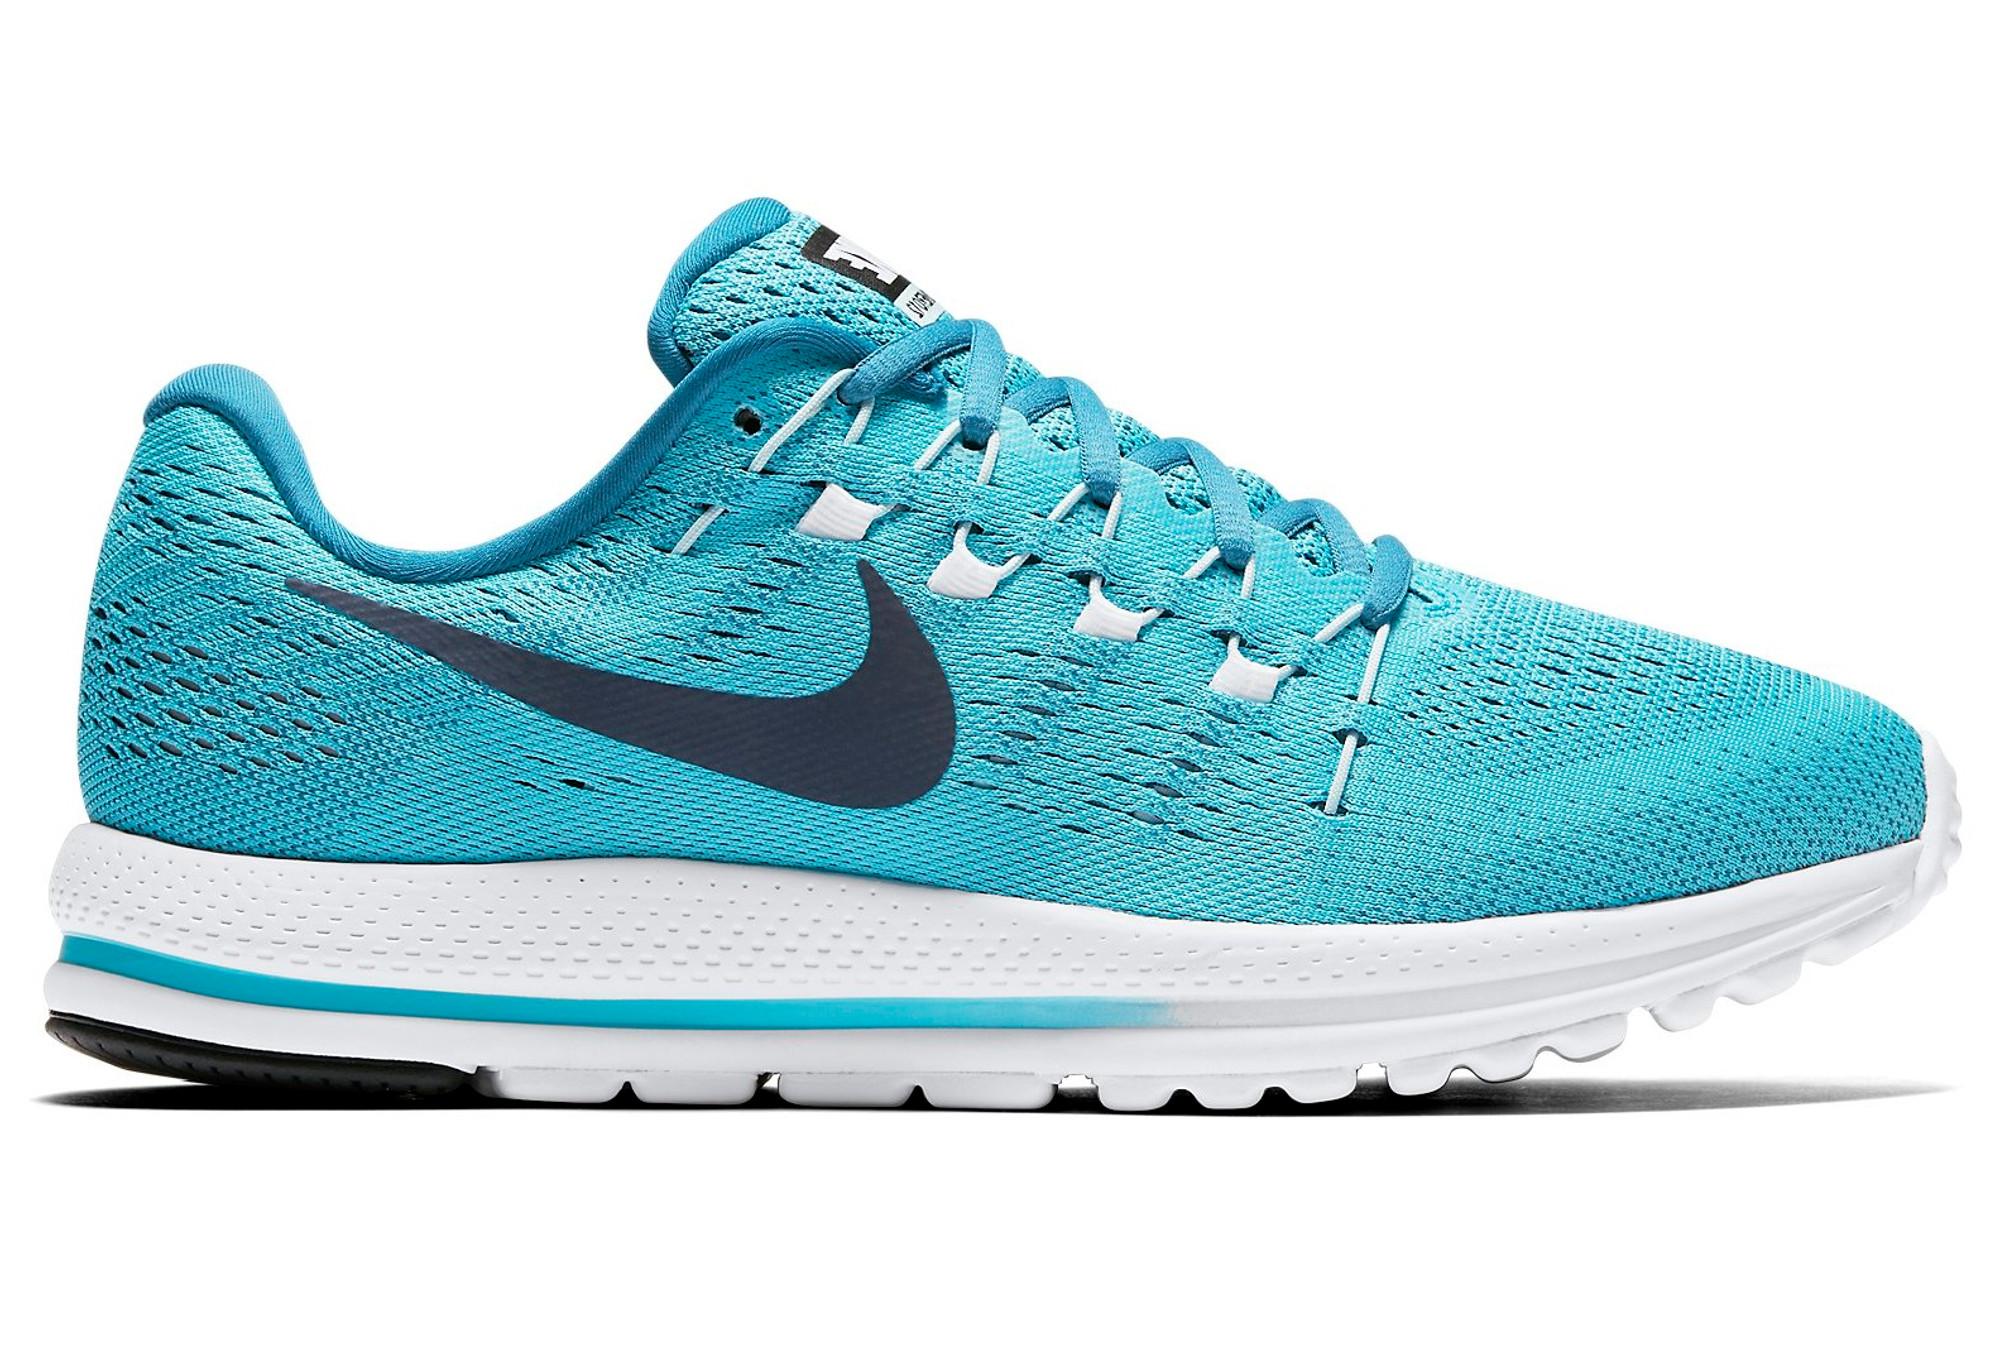 54c59997cbbf0 Chaussures de Running Nike AIR ZOOM VOMERO 12 Bleu   Blanc ...